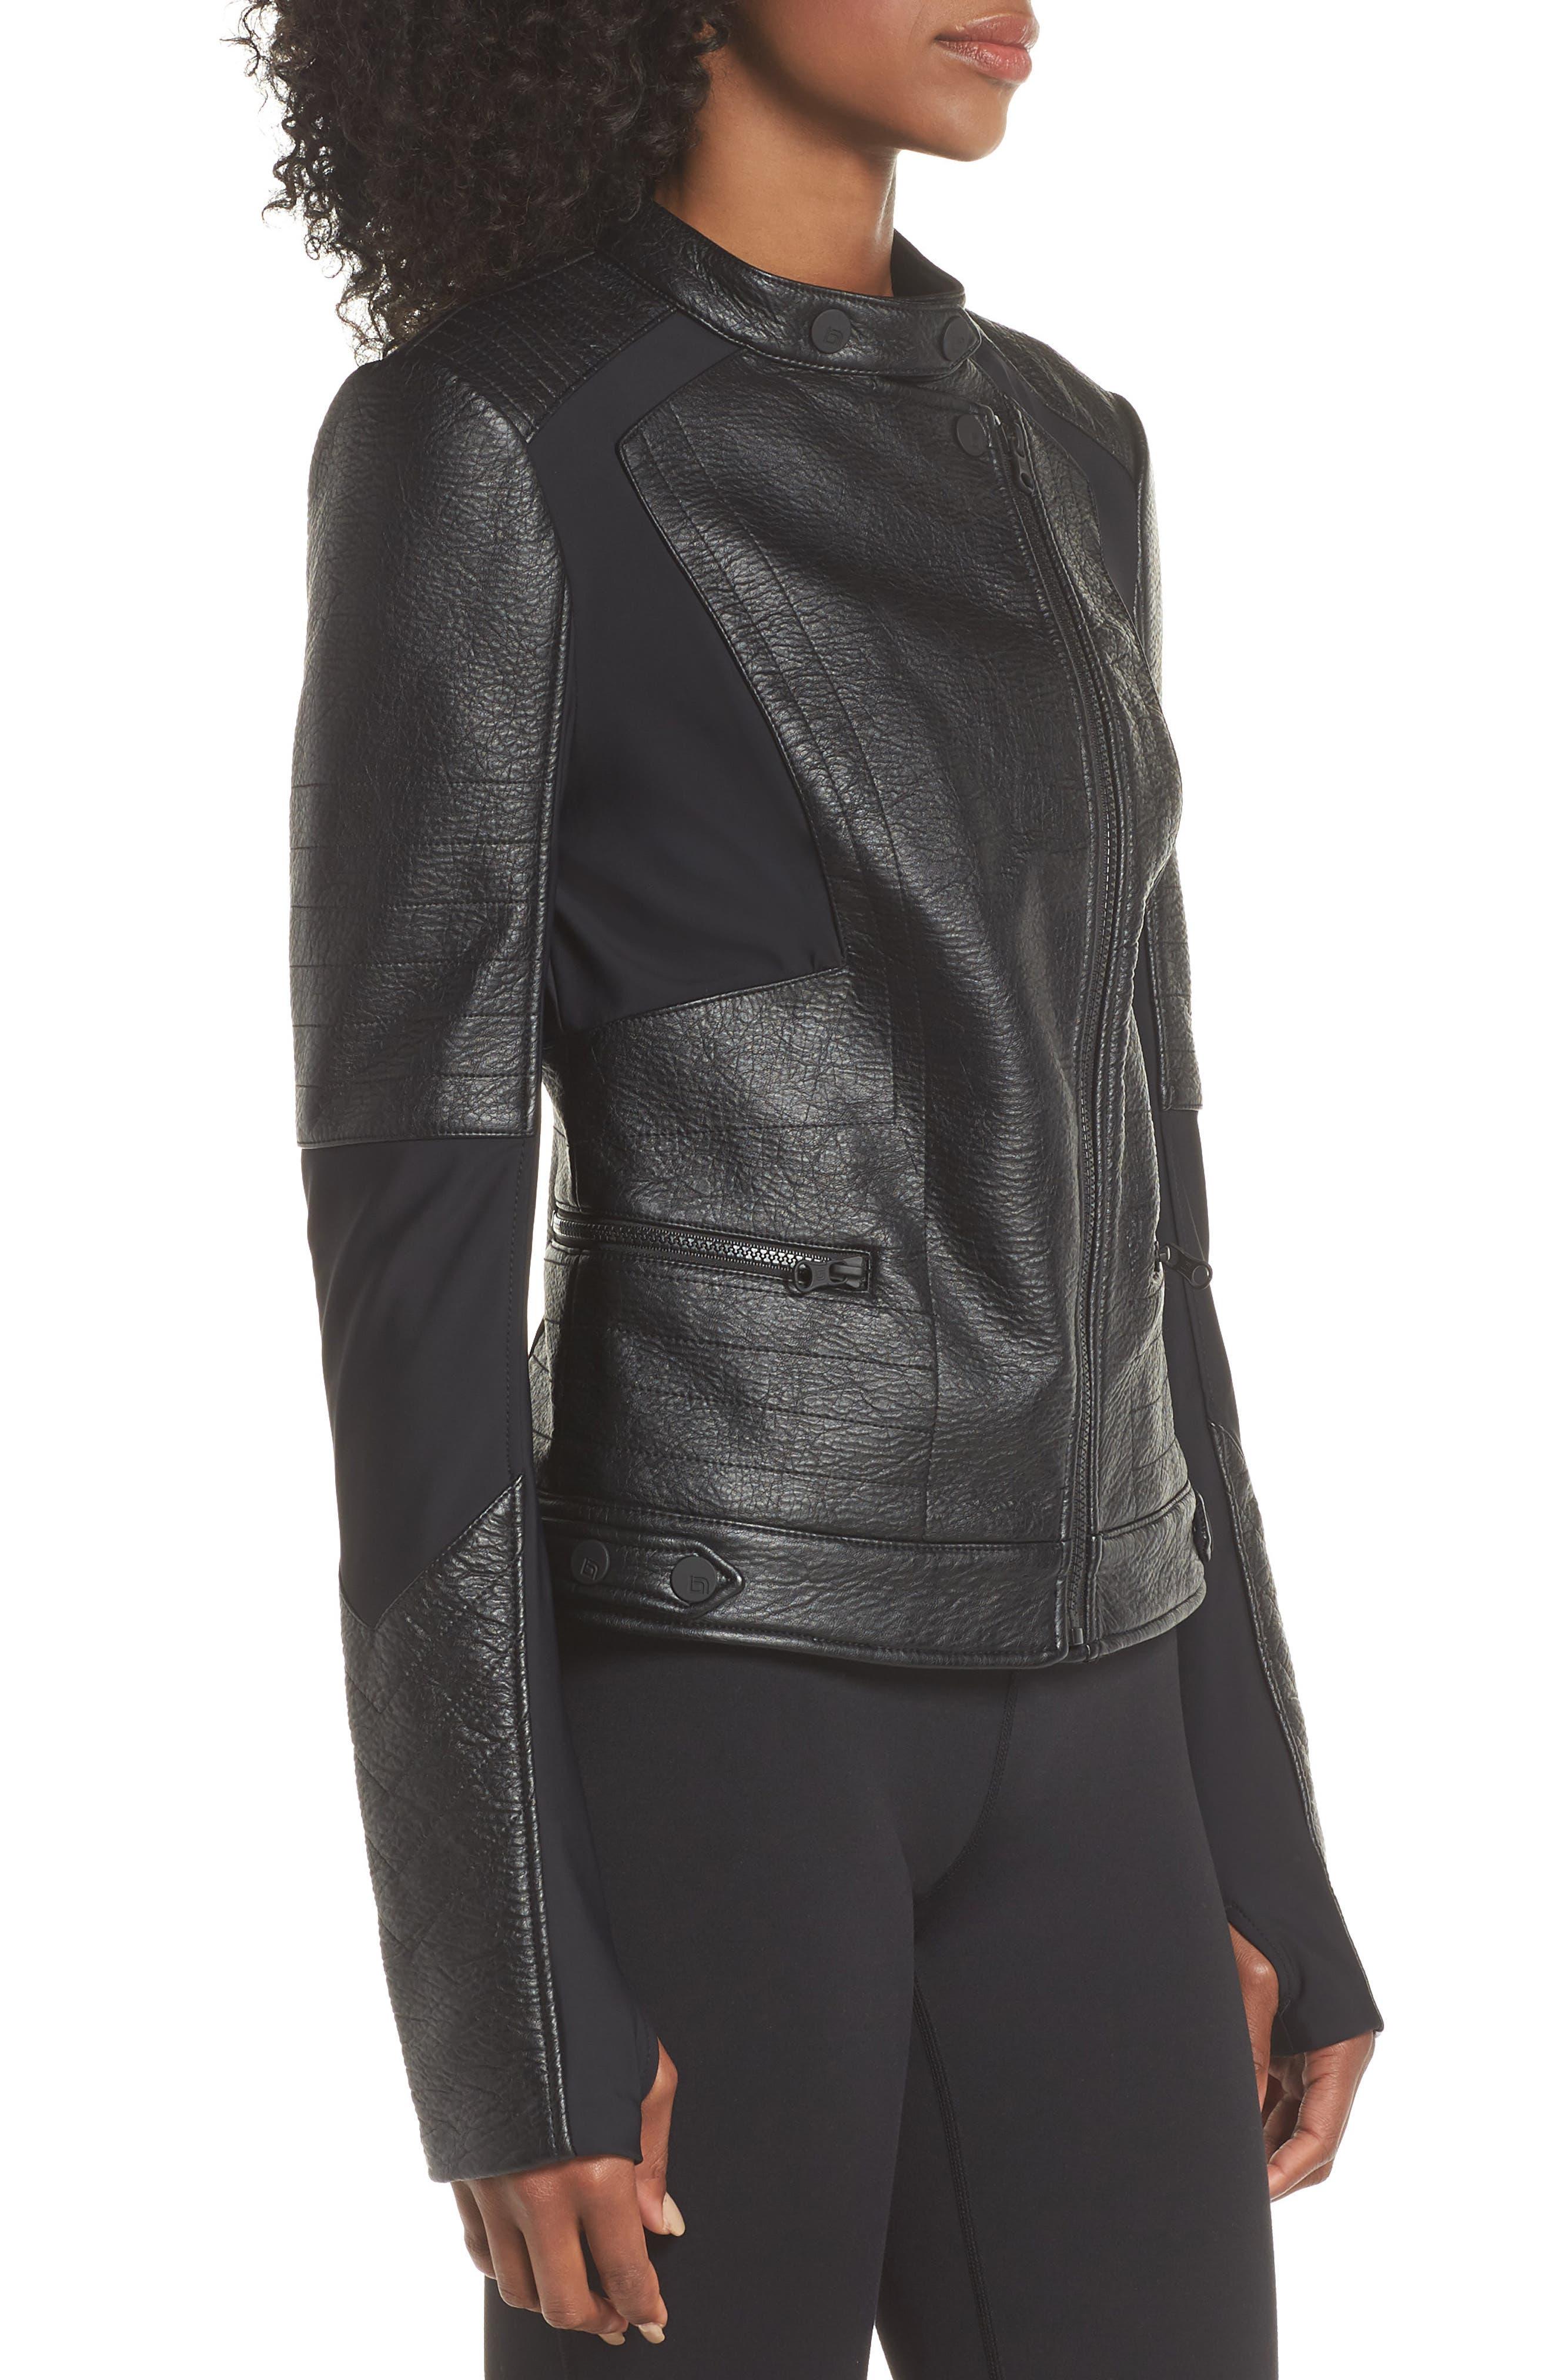 Ryder Faux Leather Moto Jacket,                             Alternate thumbnail 3, color,                             BLACK/ GREY